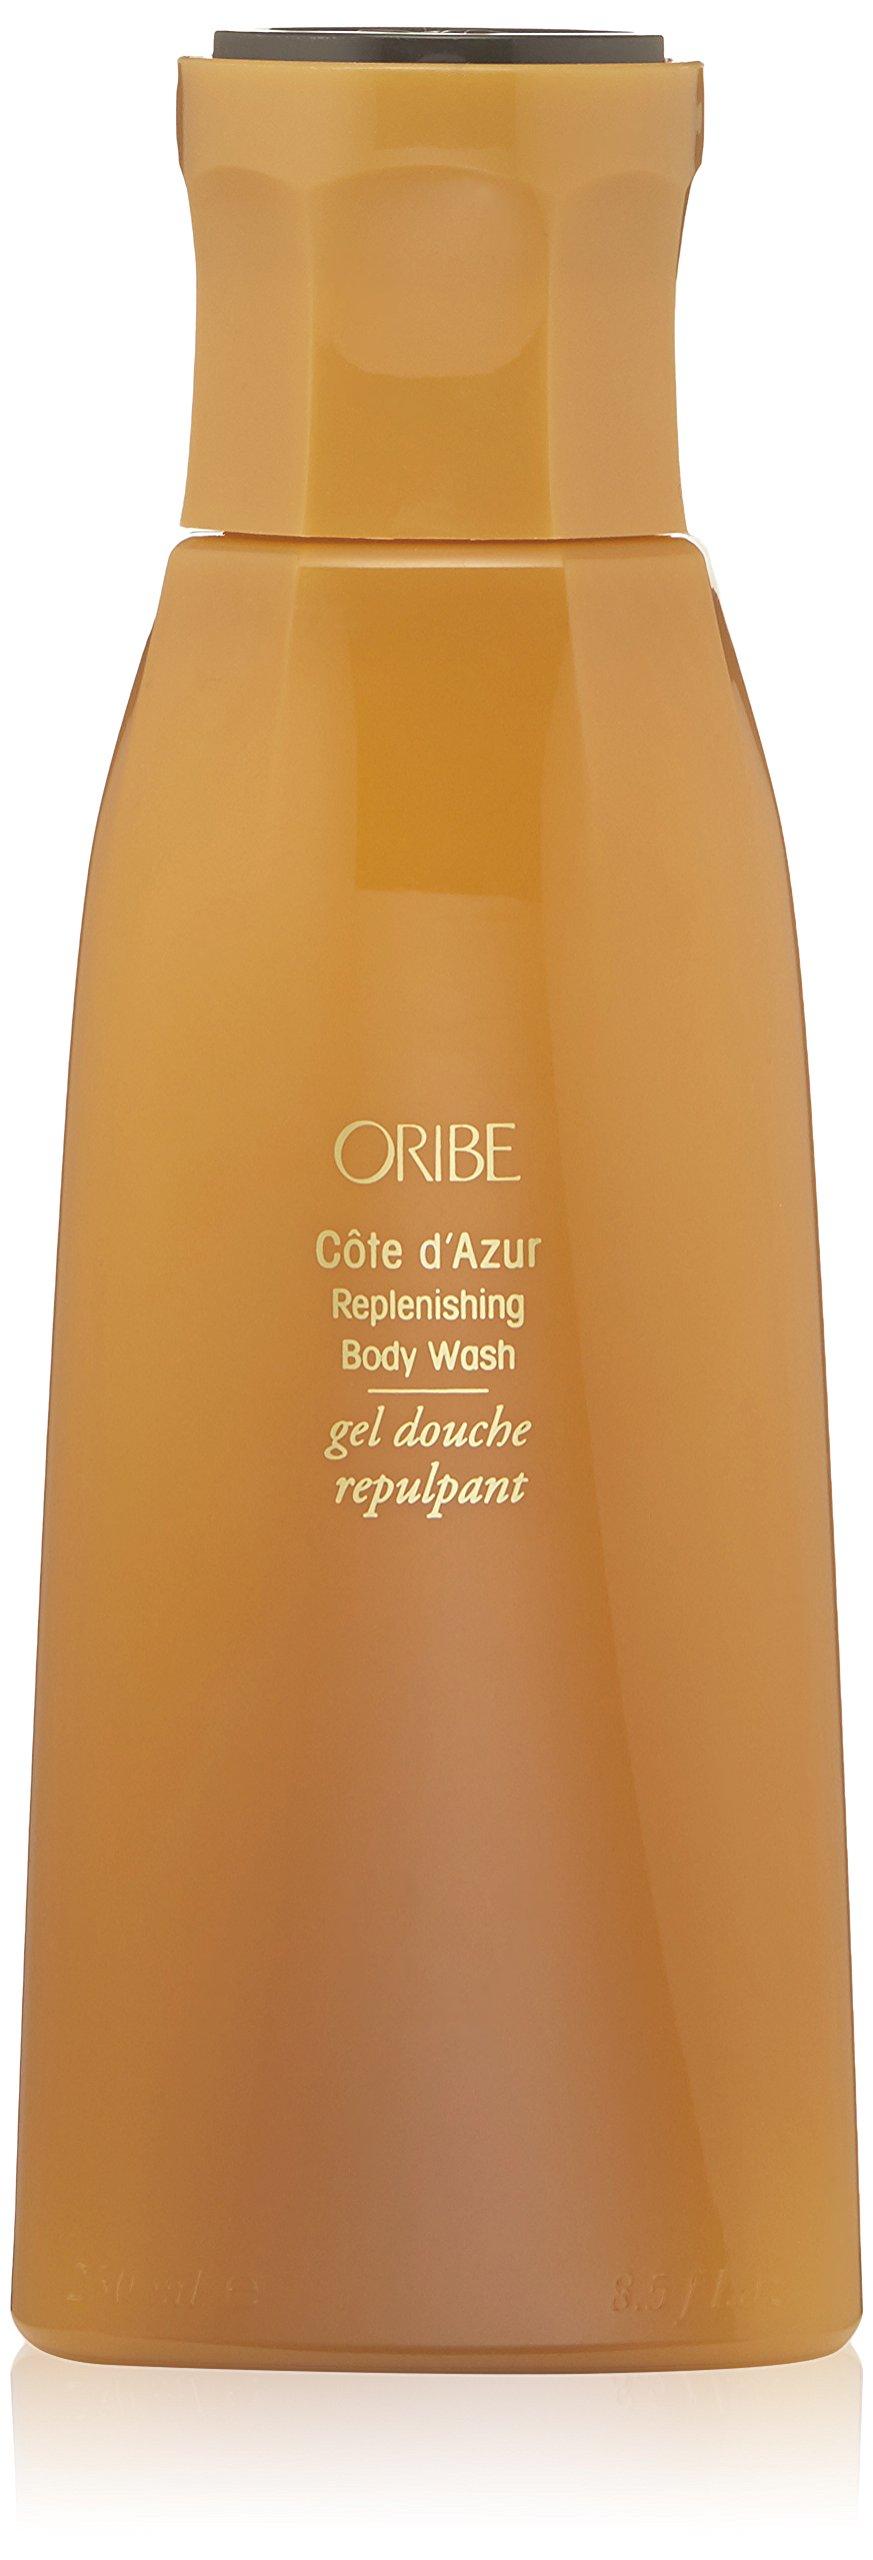 ORIBE Travel Cote D'azur Replenishing Body Wash,8.5 Fl Oz